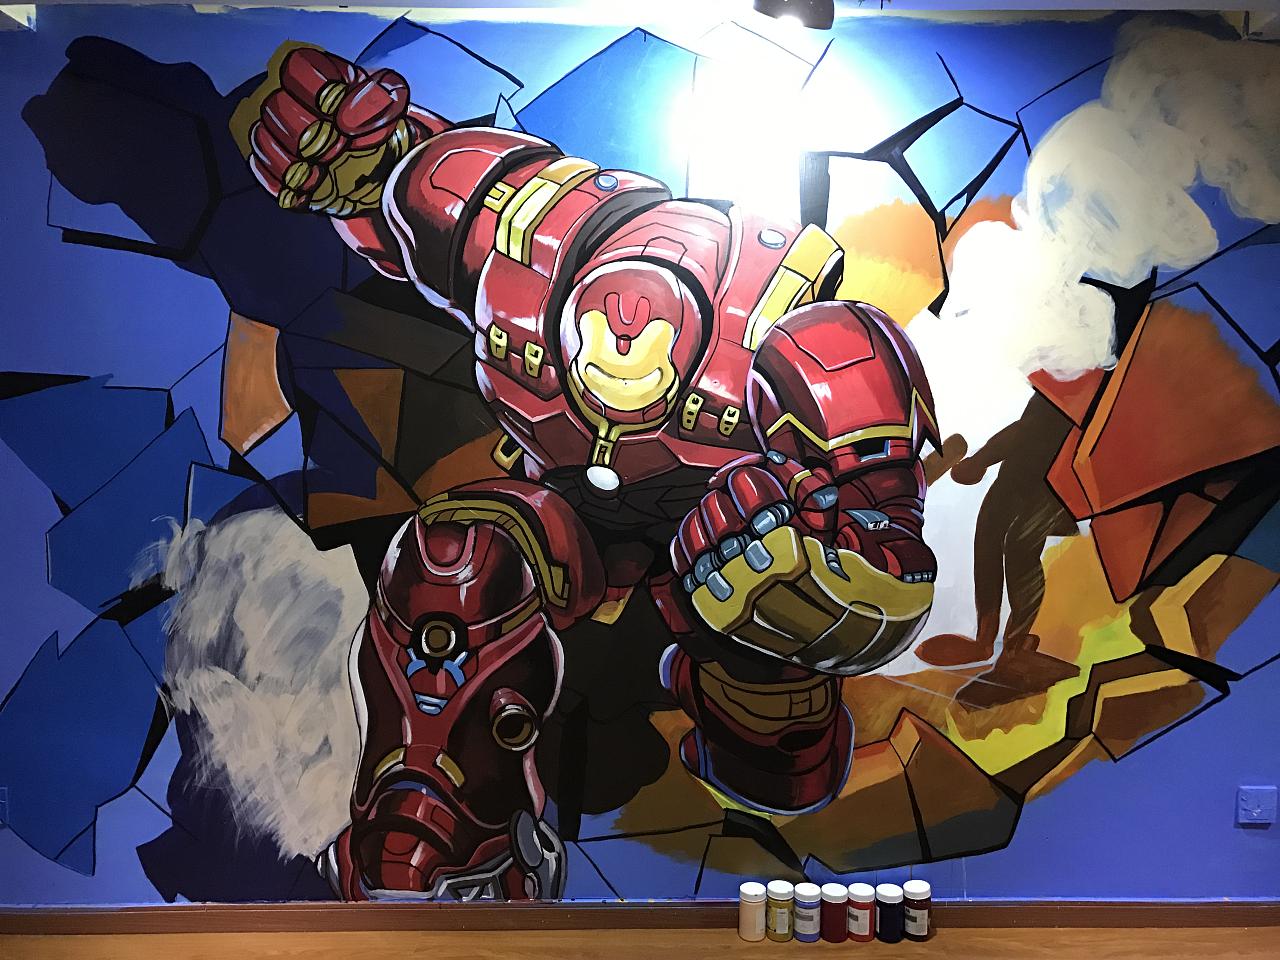 【3d加强版变形金刚】|其他|墙绘/立体画|绘汉zf